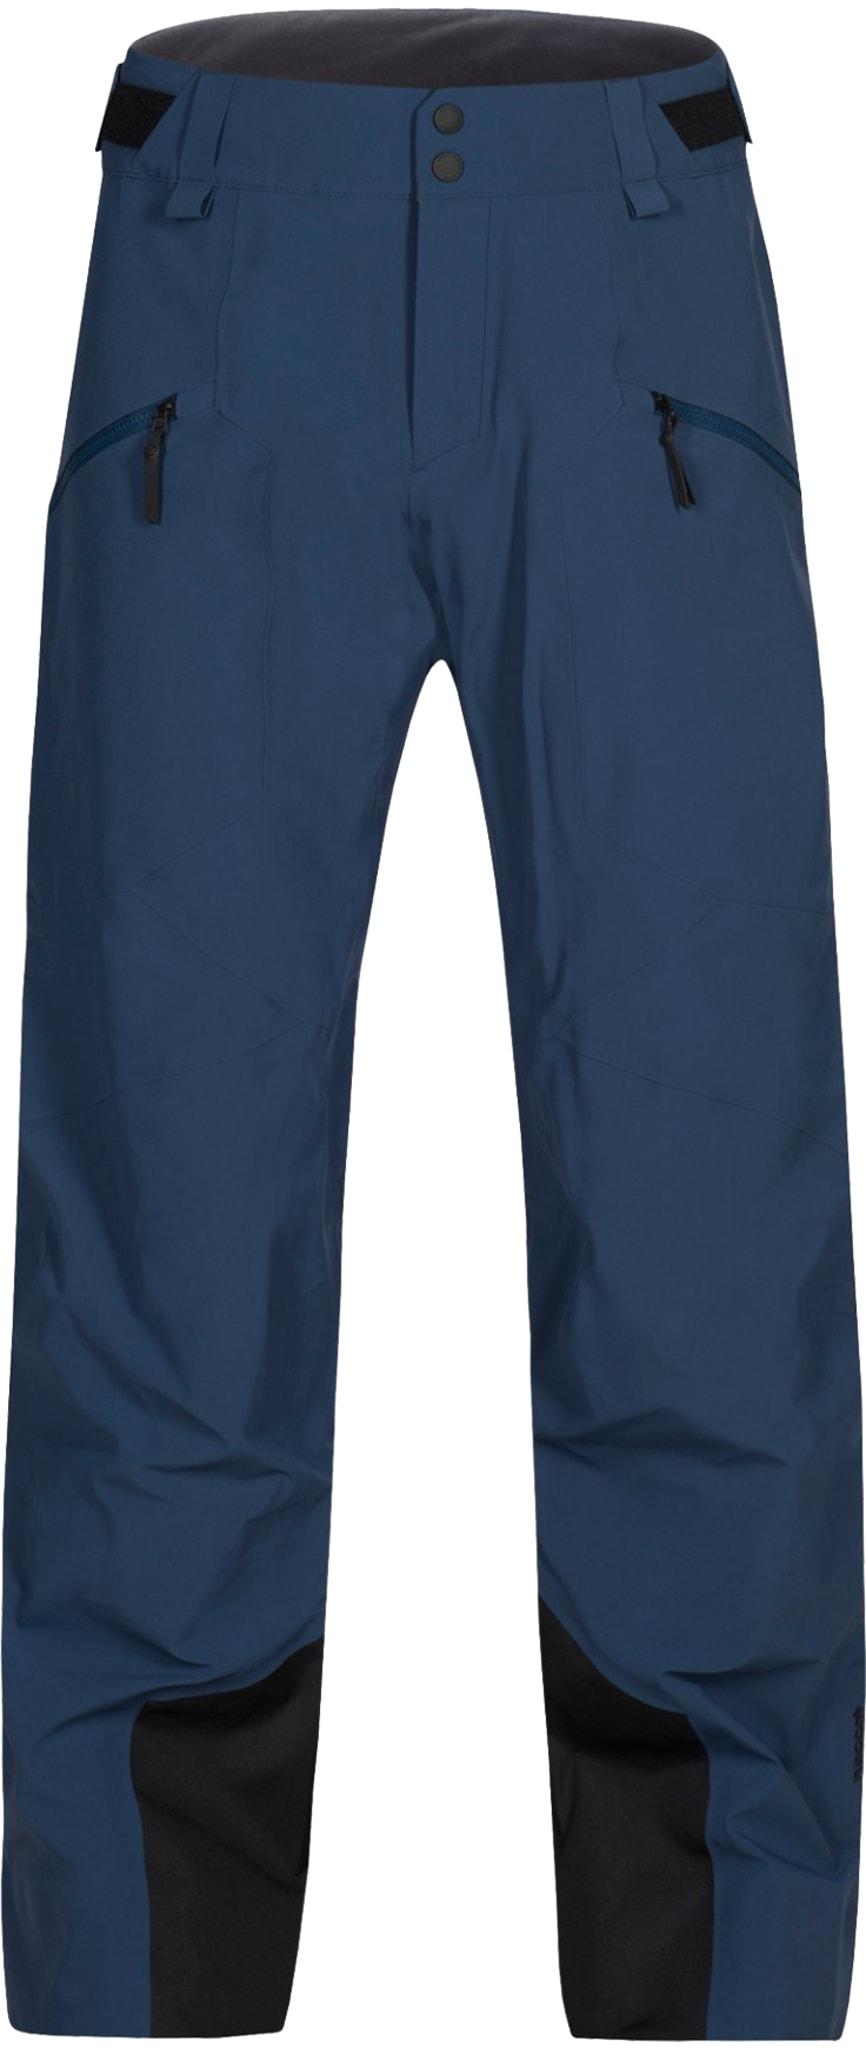 Radical Pants M